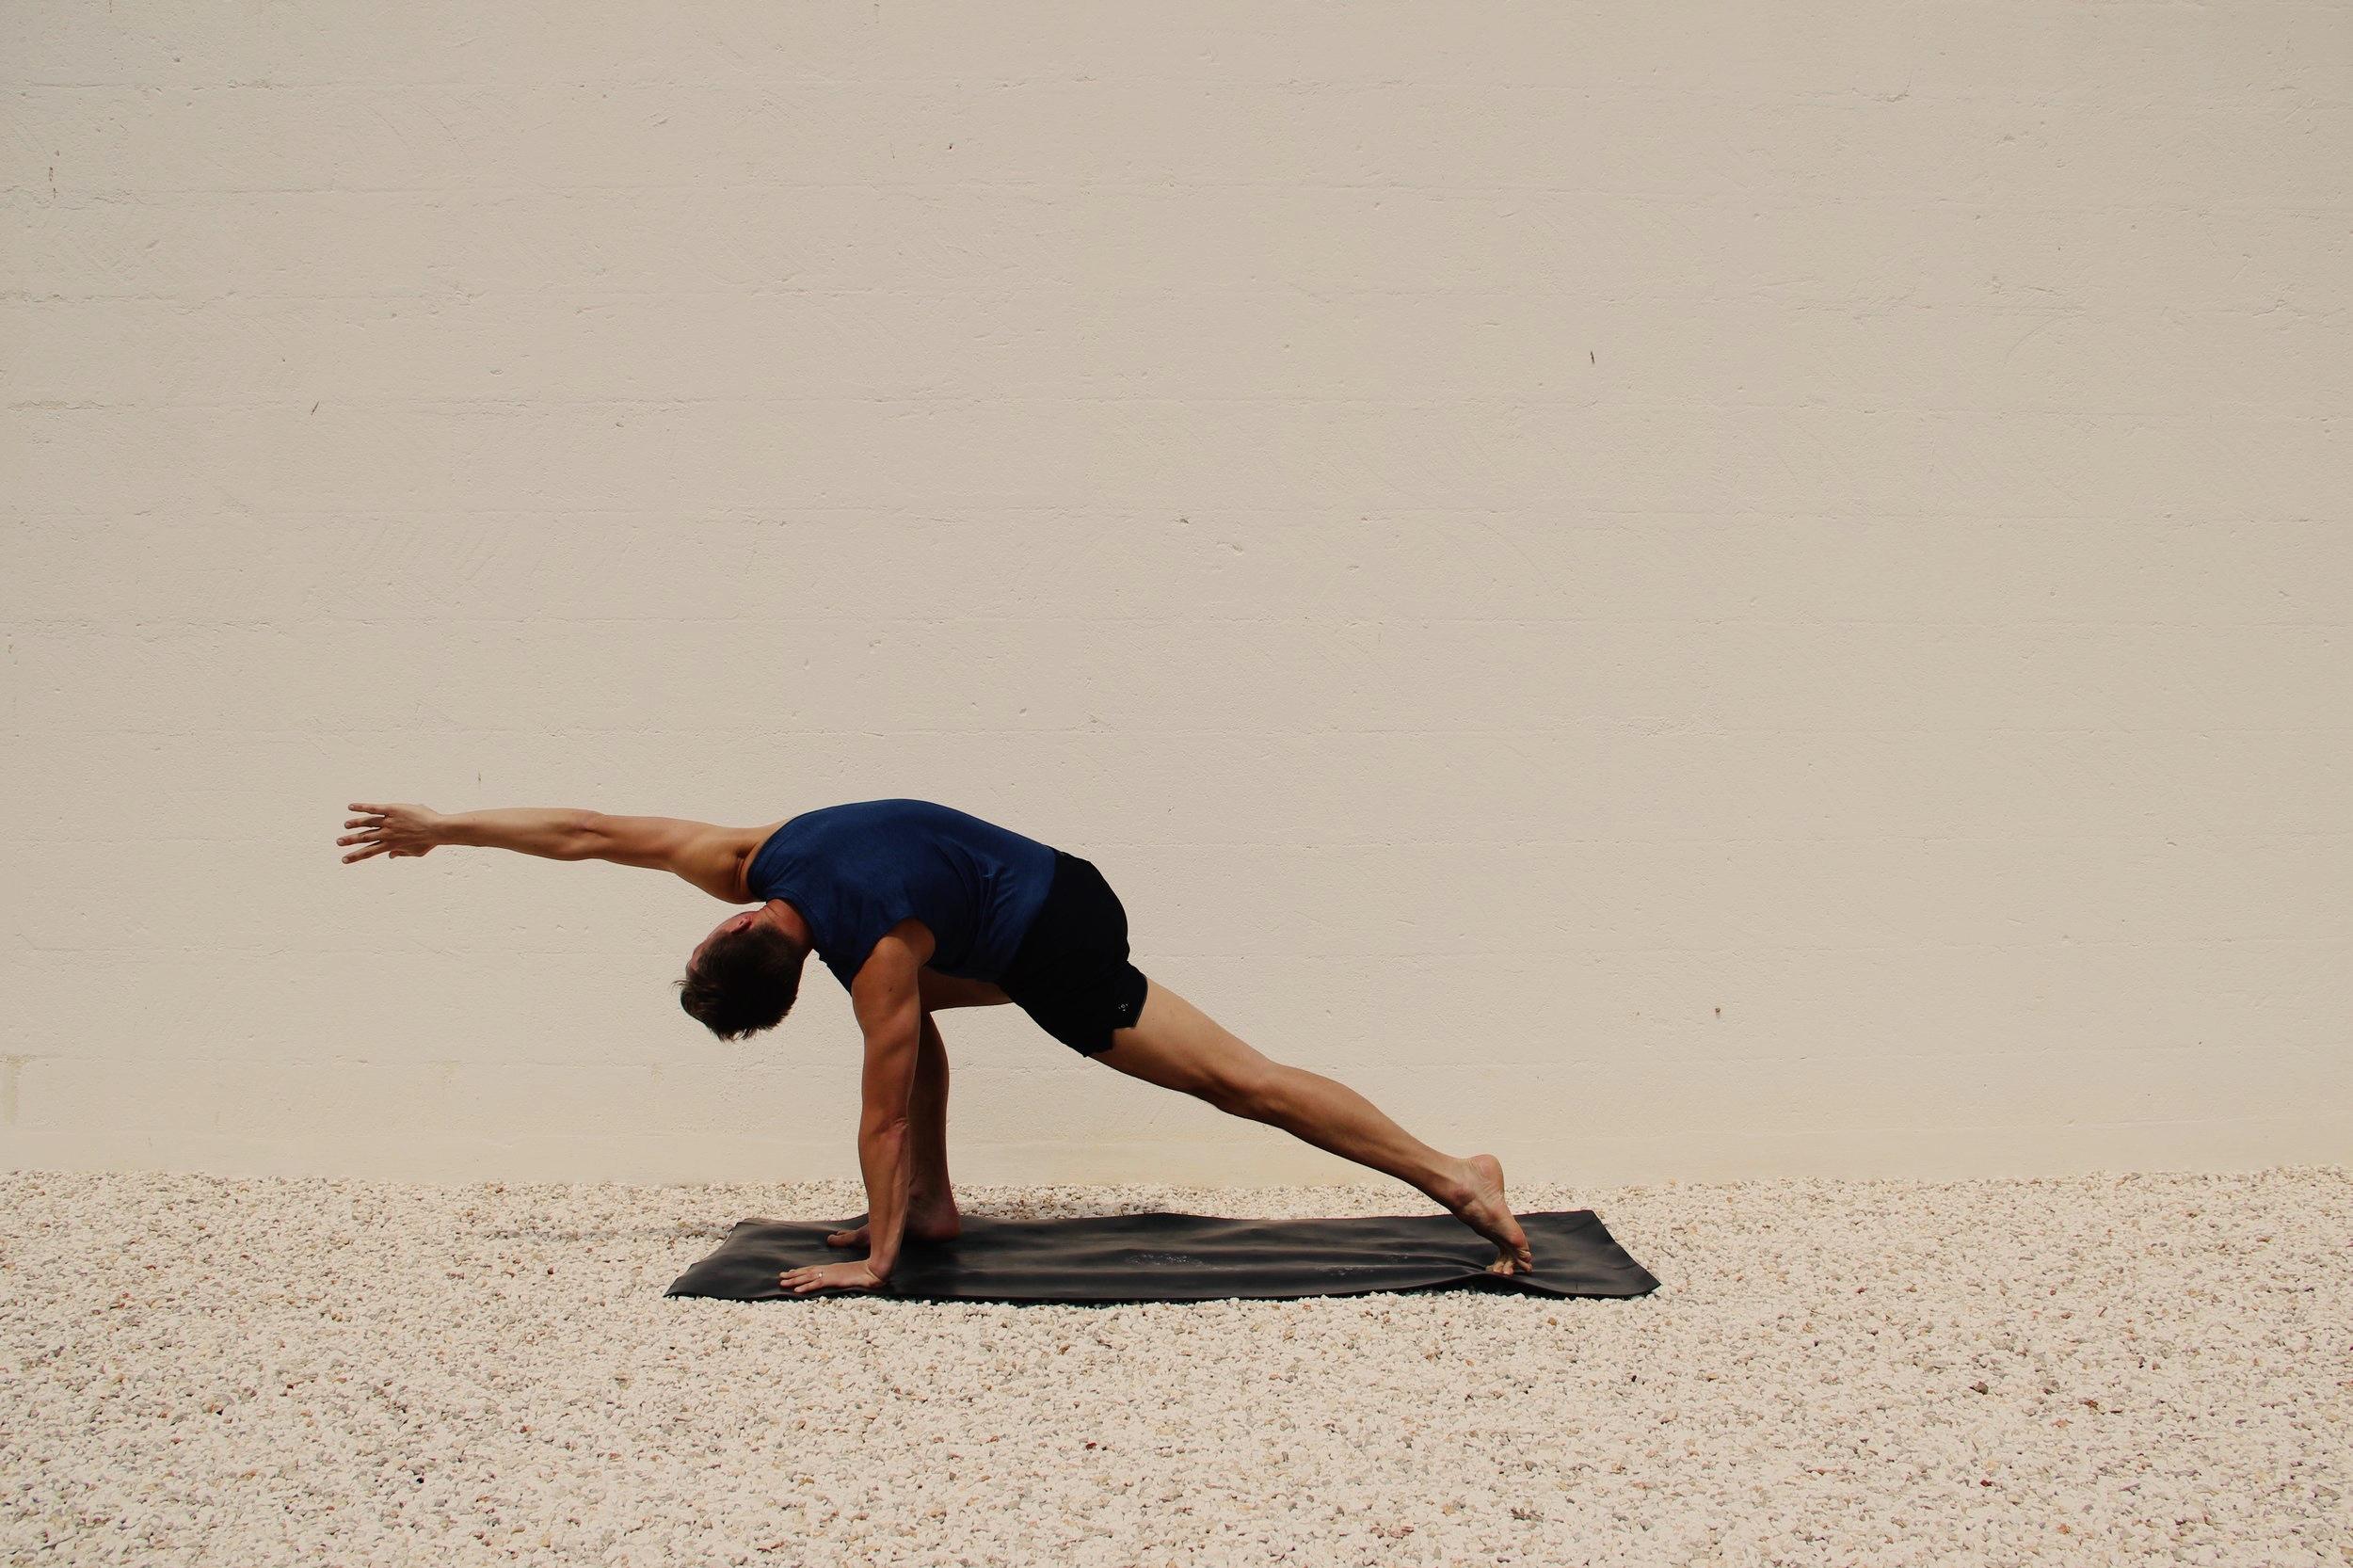 SPACE M YOGA - yoginis yogastudio